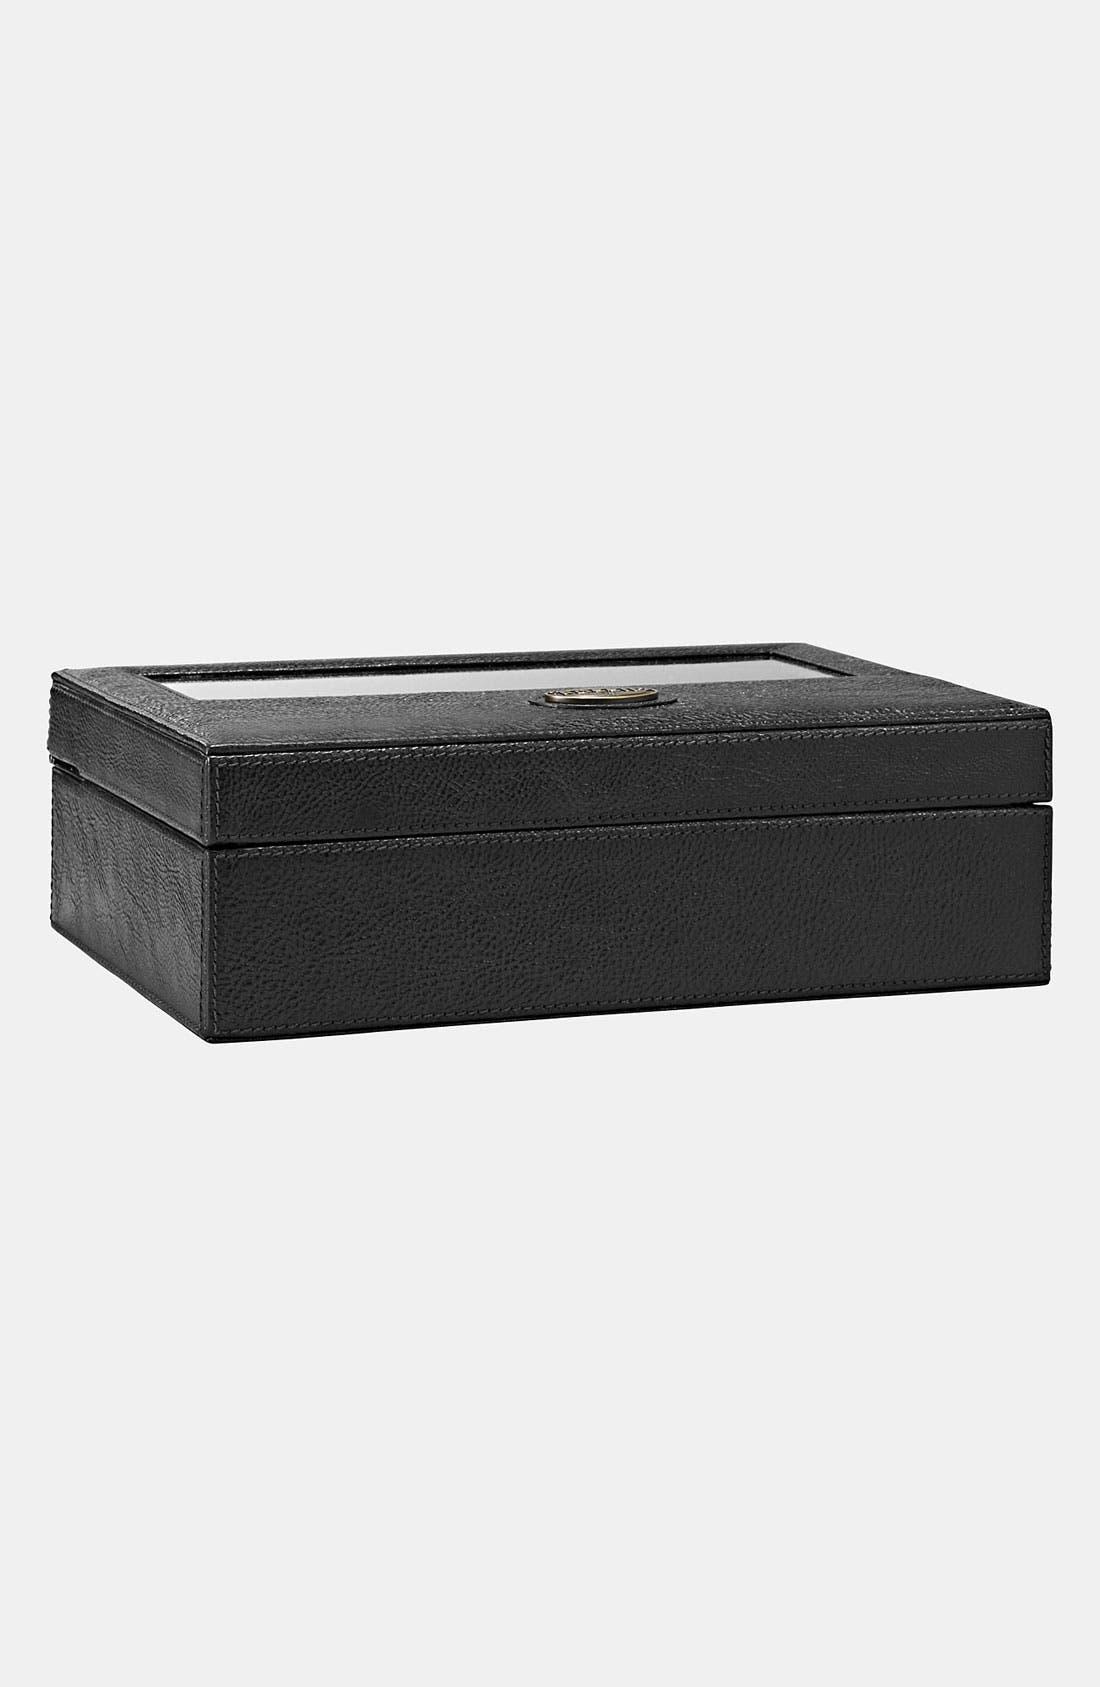 Main Image - Fossil 'Estate' Five Piece Watch Box